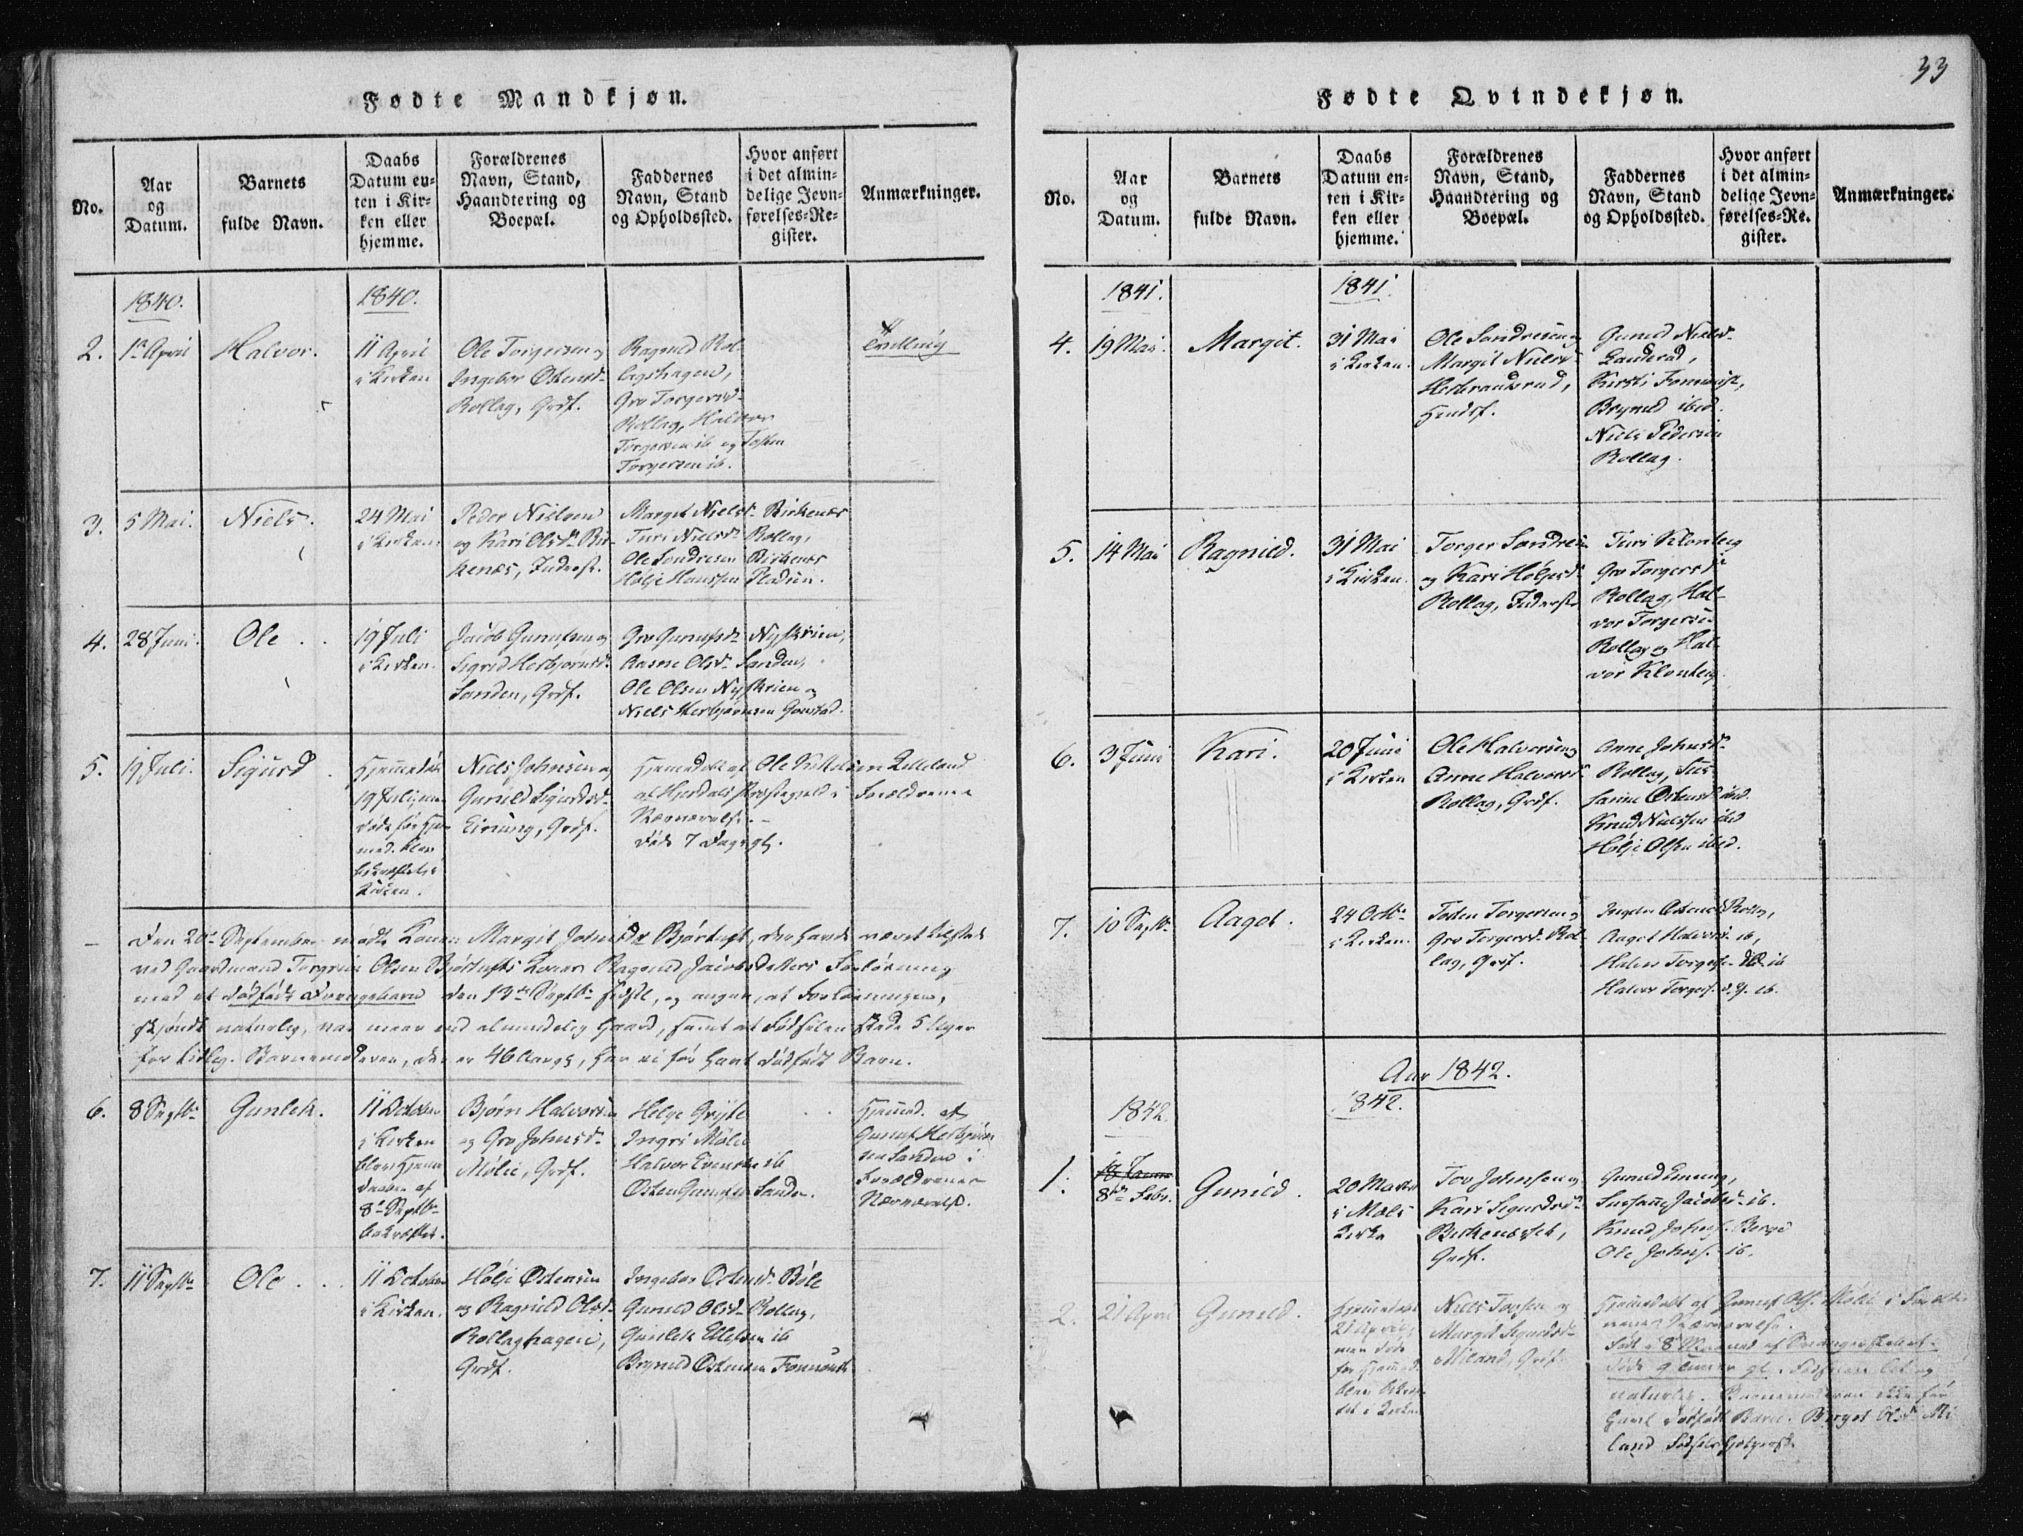 SAKO, Tinn kirkebøker, F/Fb/L0001: Ministerialbok nr. II 1, 1815-1843, s. 33